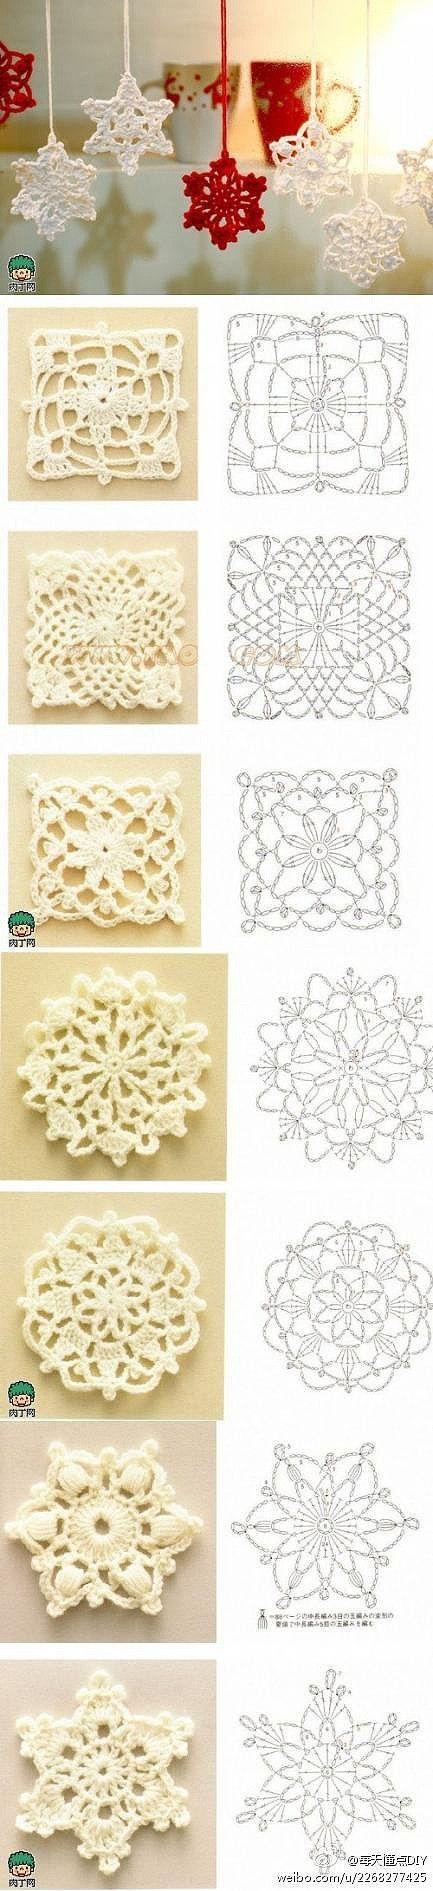 Snowflakes crochet patterns @Samantha @AbdulAziz Bukhamseen Home Sweet Home Blog Brooks I smell a pre Christmas craft